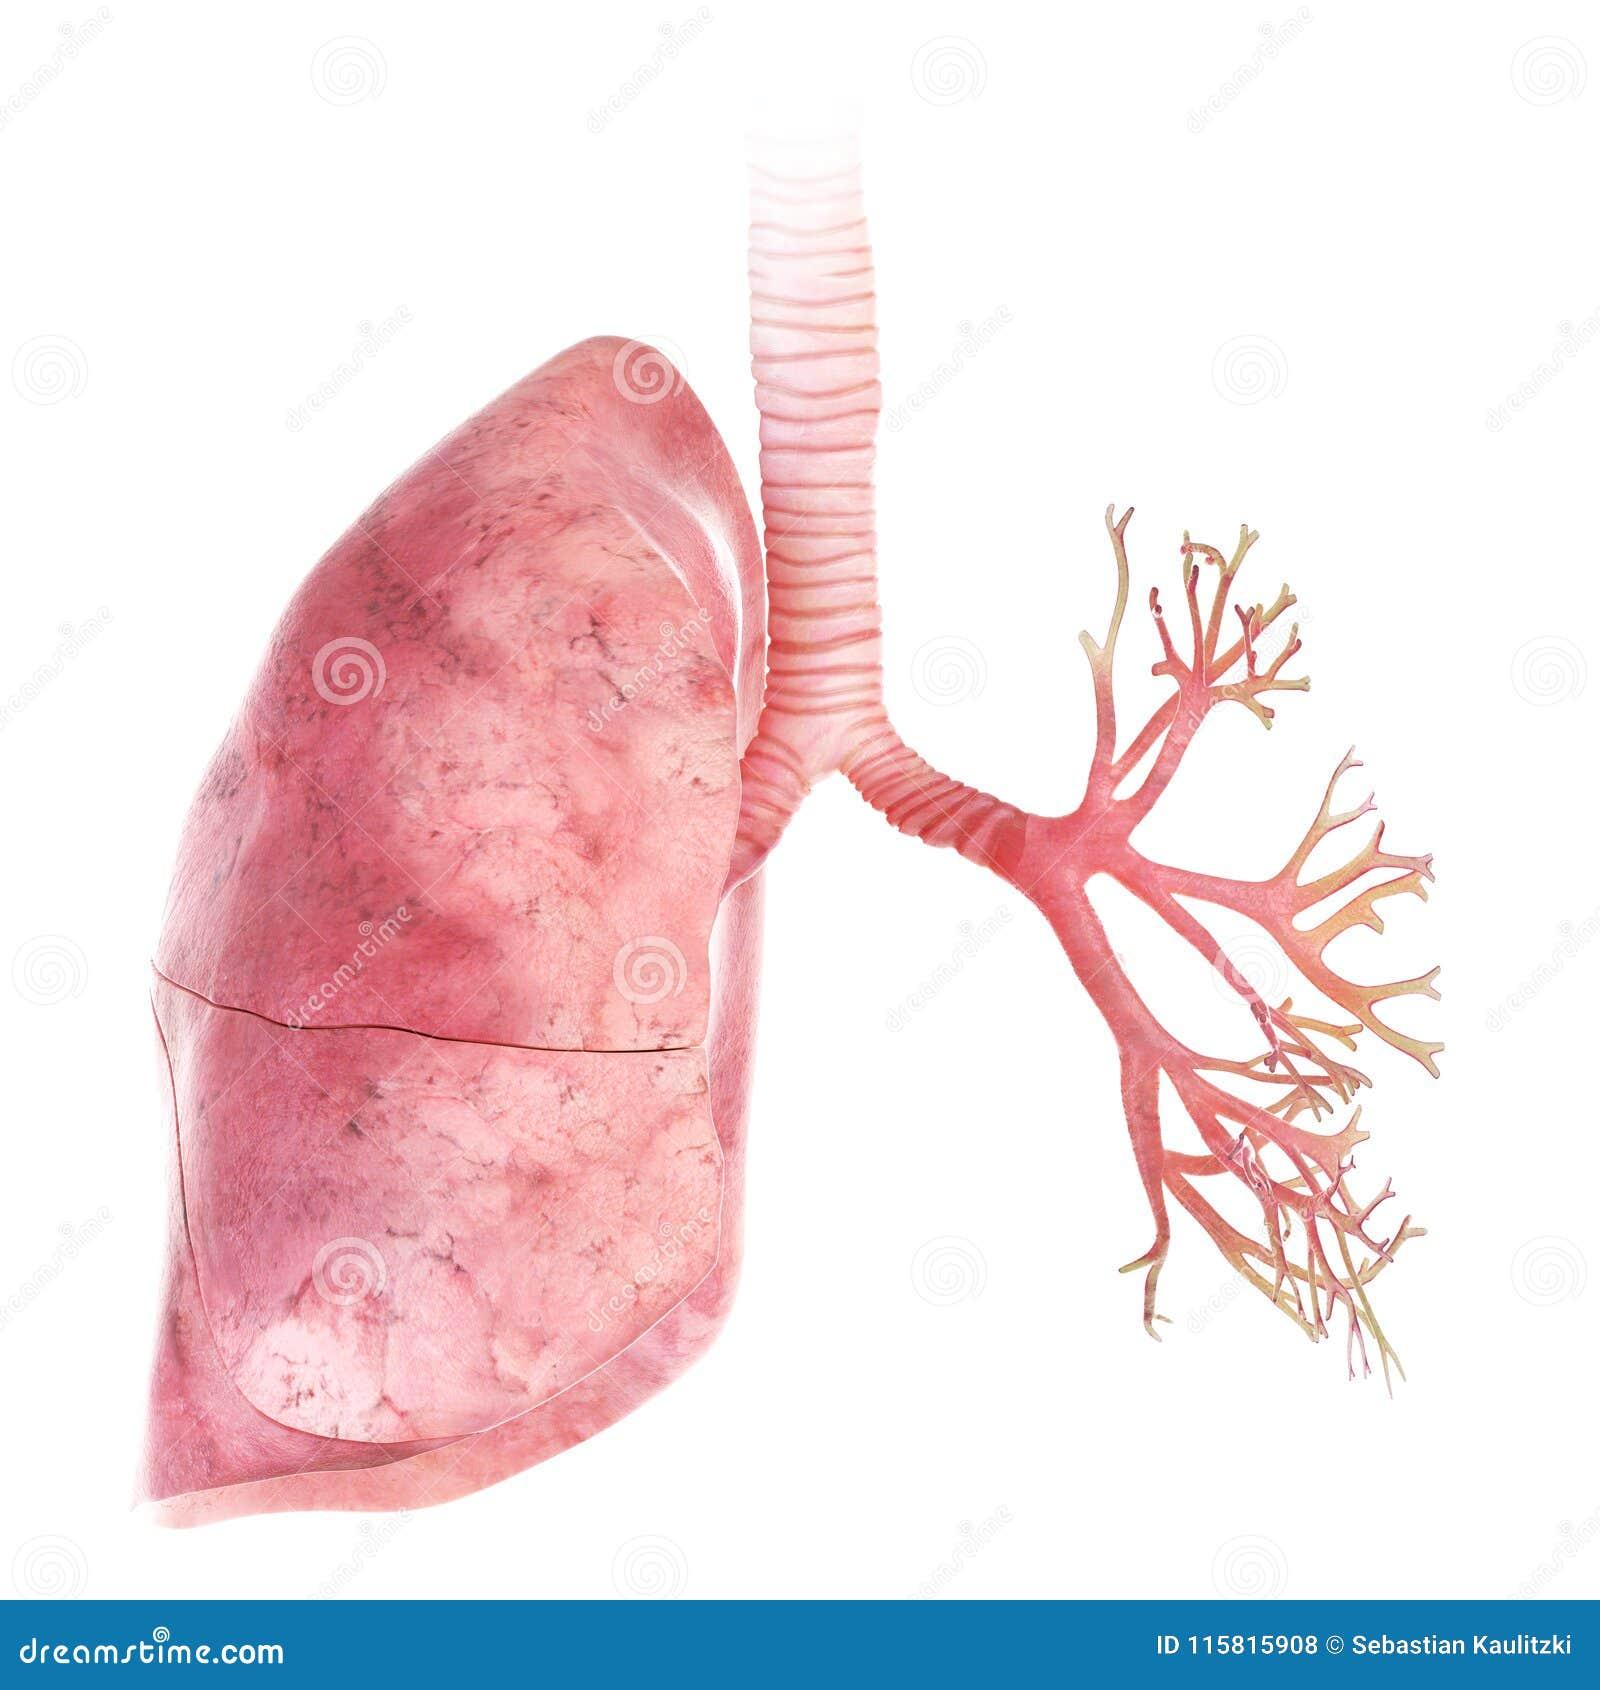 De long en de bronchiën